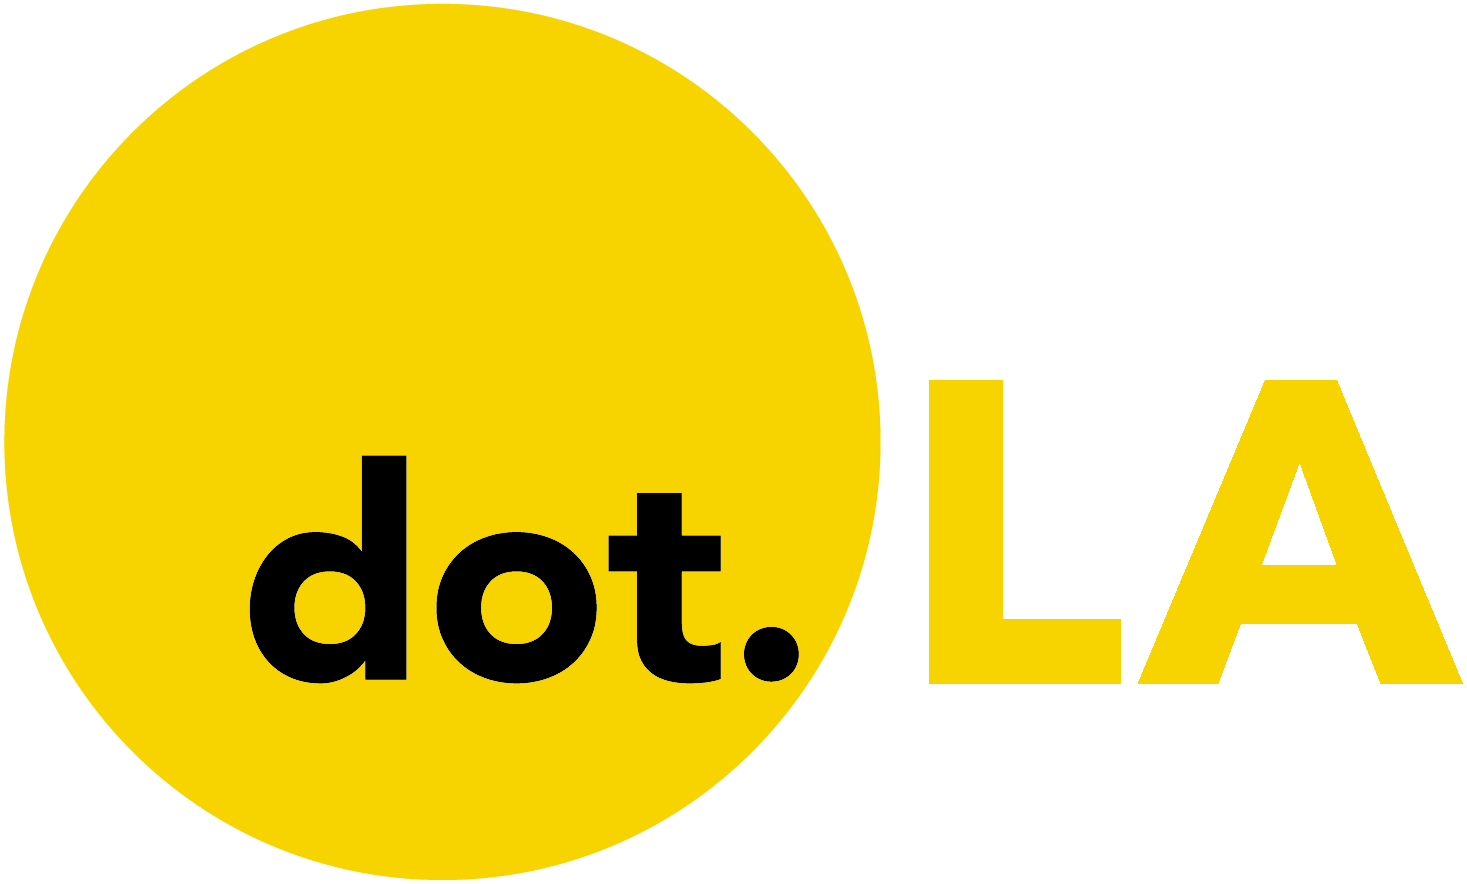 dotla